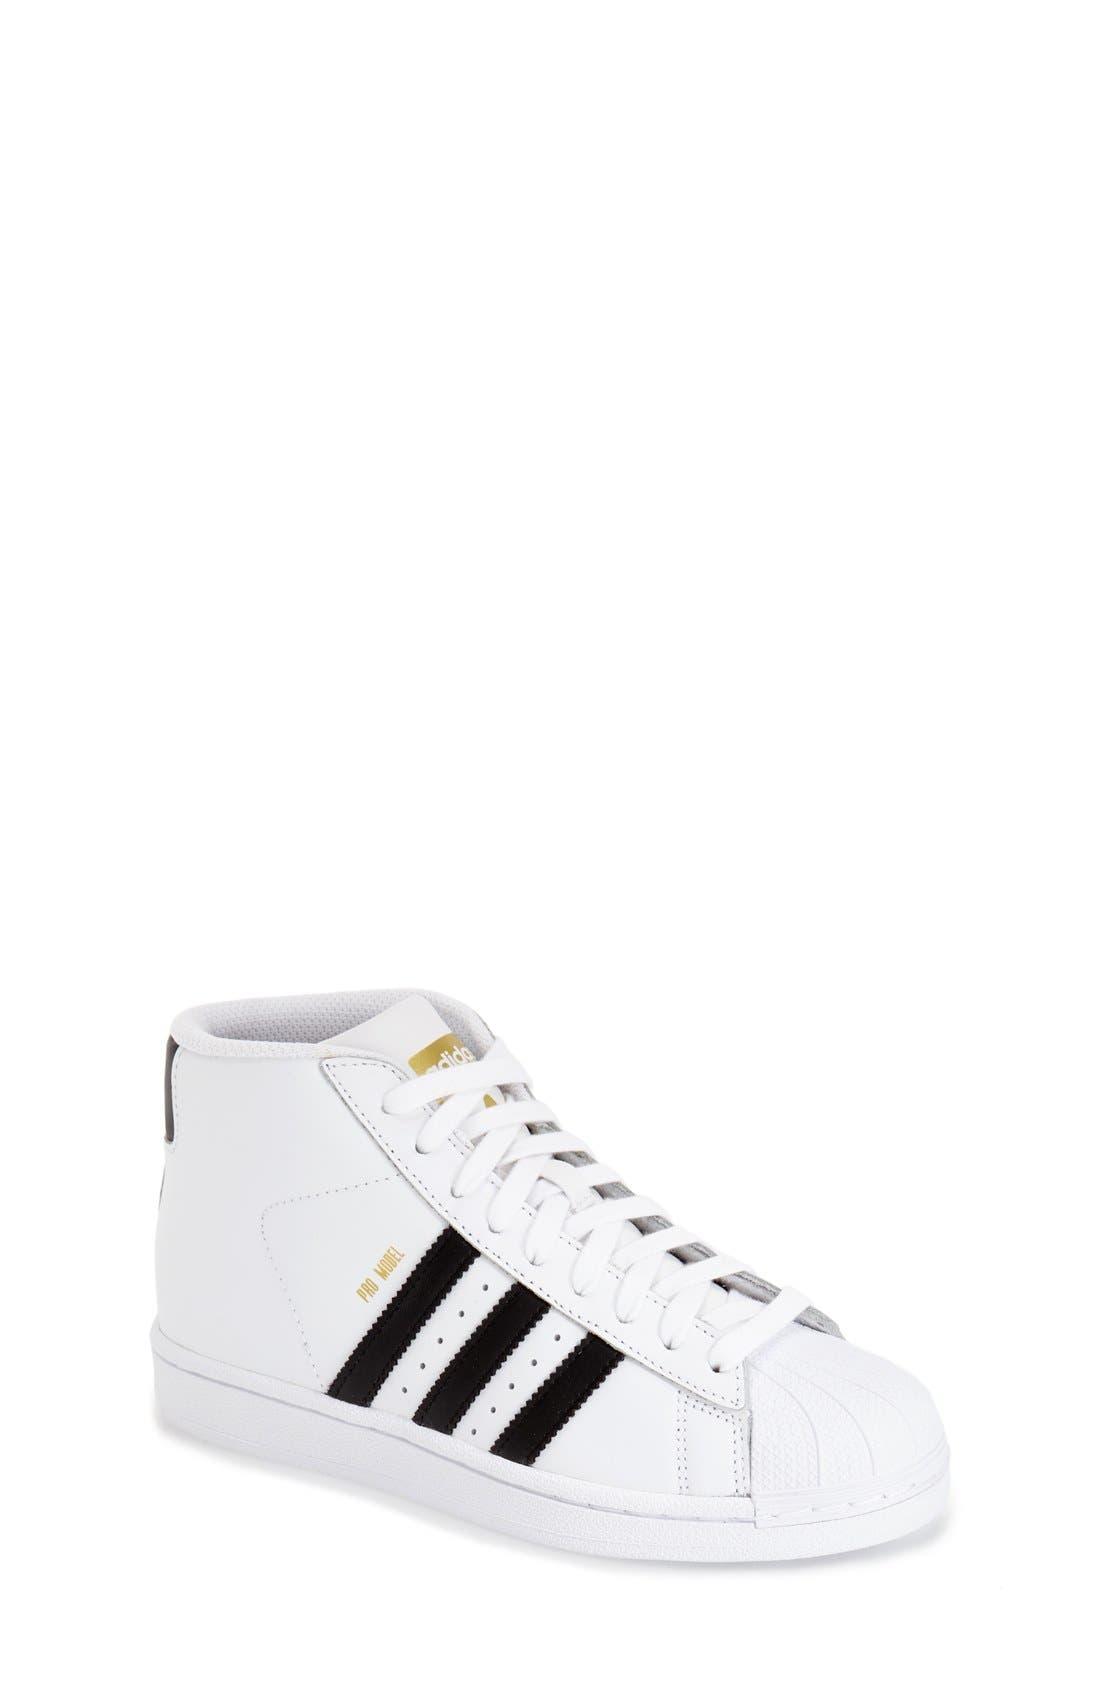 Alternate Image 1 Selected - adidas 'Pro Model' High Top Sneaker (Big Kid)